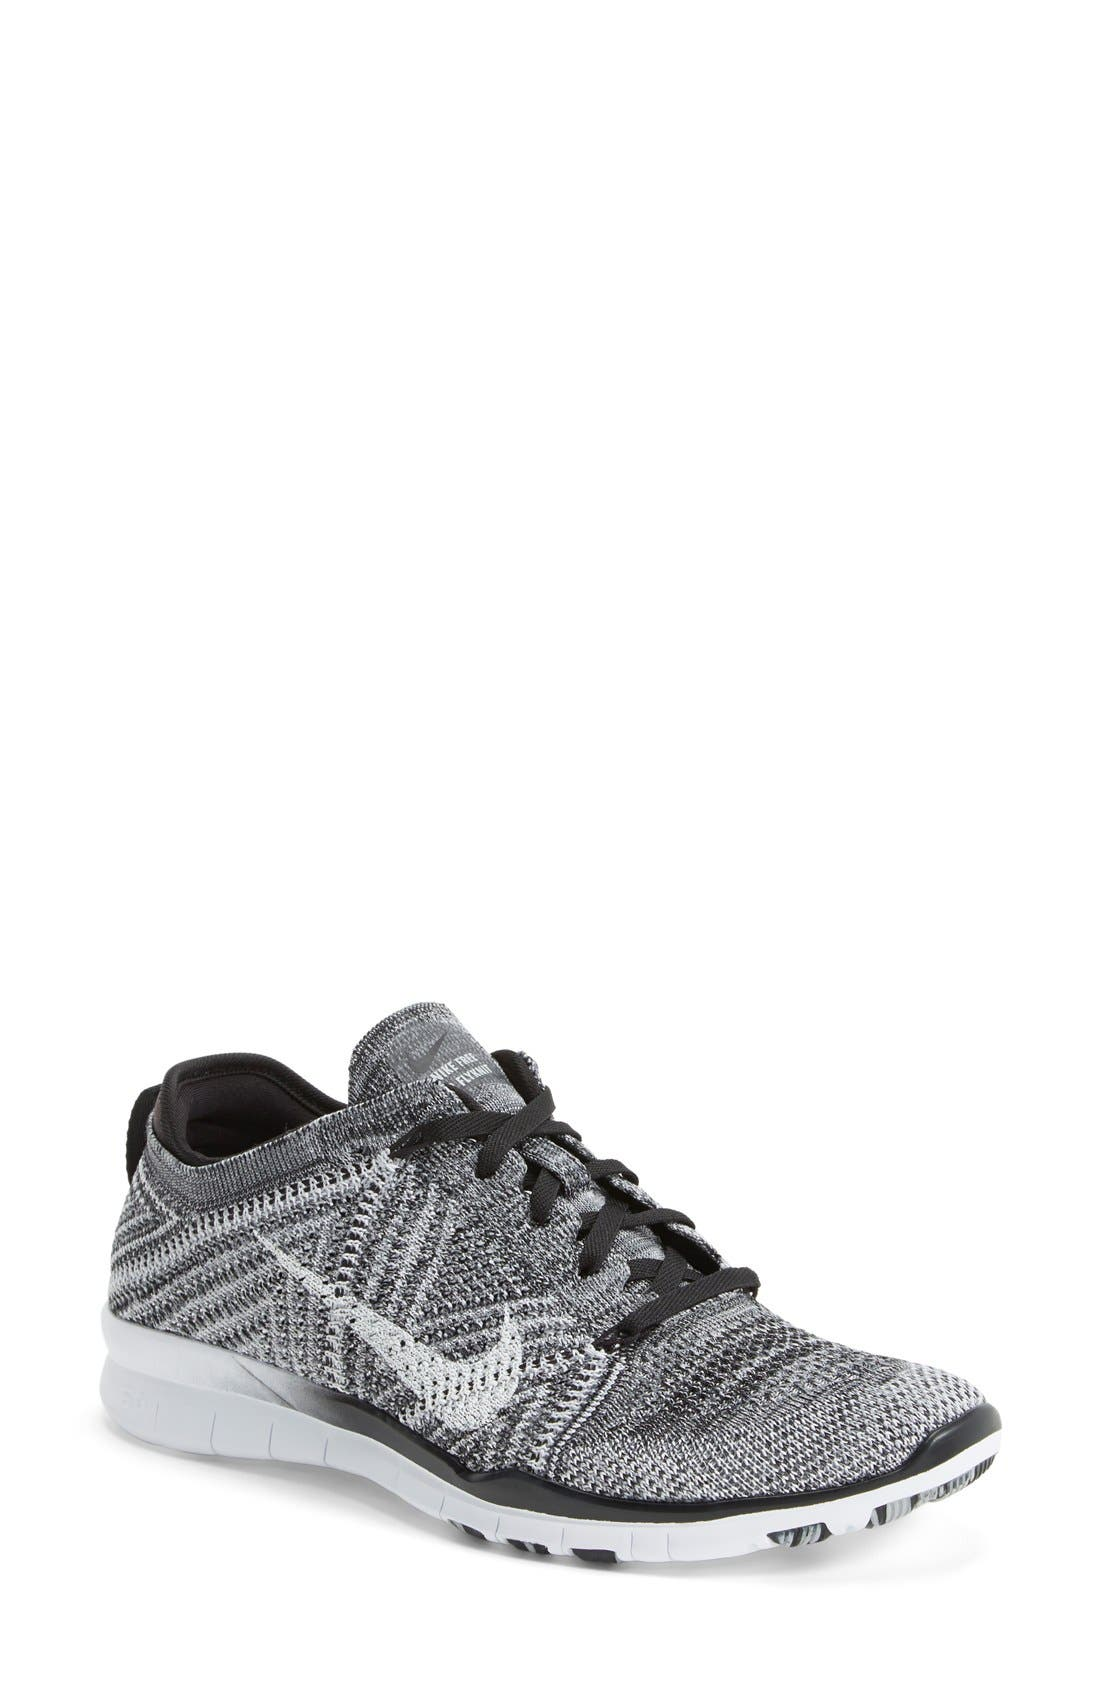 Alternate Image 1 Selected - Nike 'Free Flyknit 5.0 TR' Training Shoe (Women)